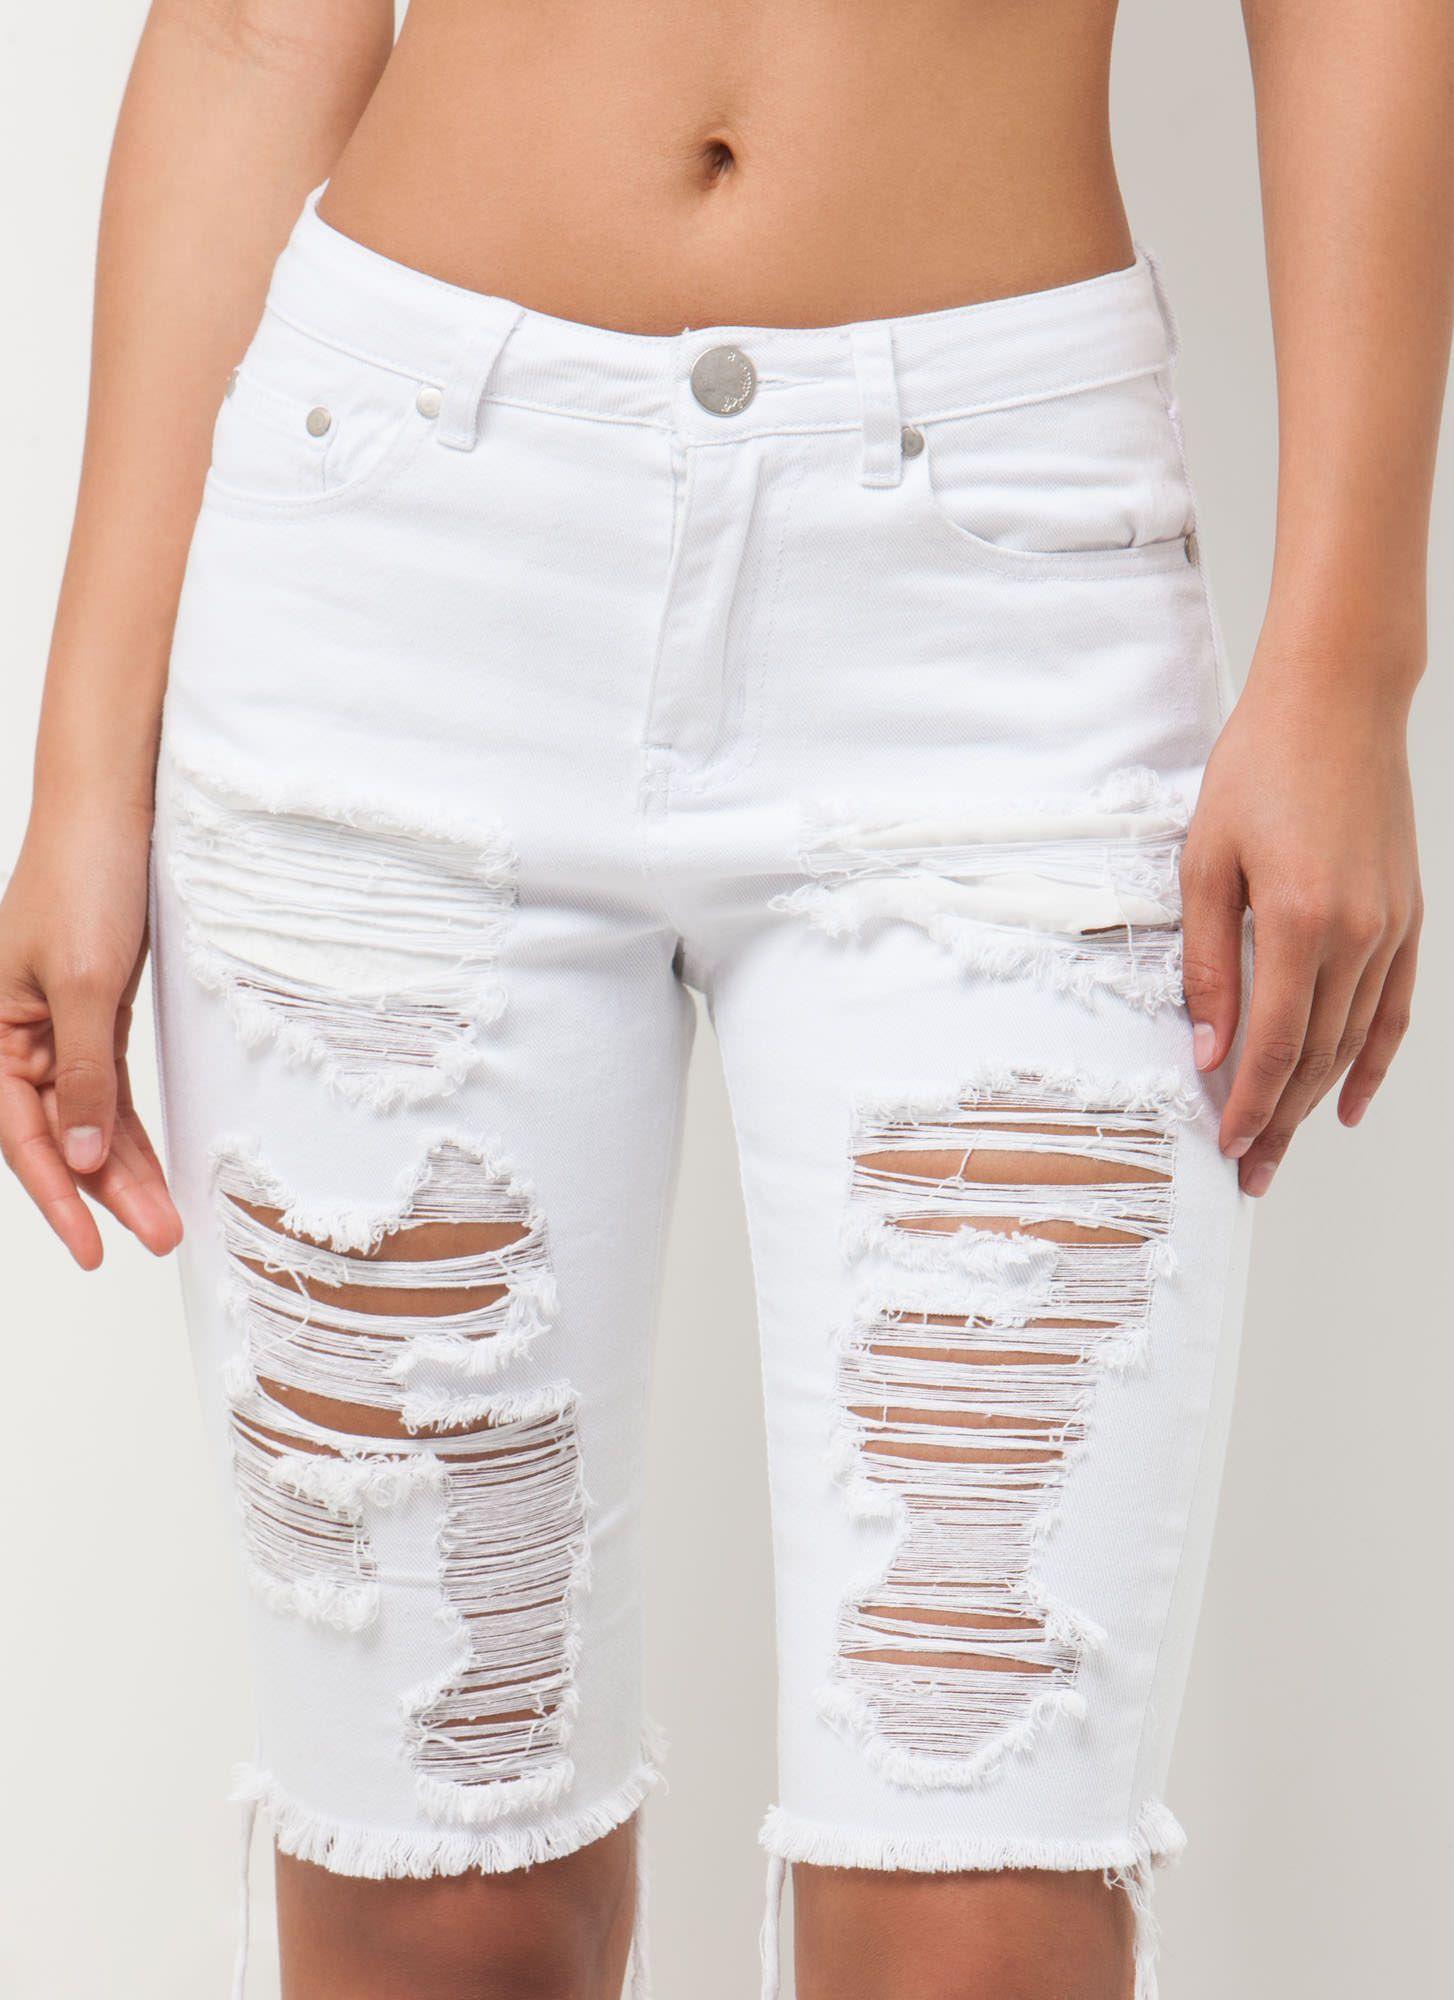 Unwind Distressed Denim Bermuda Shorts WHITE | Fun summer outfits ...